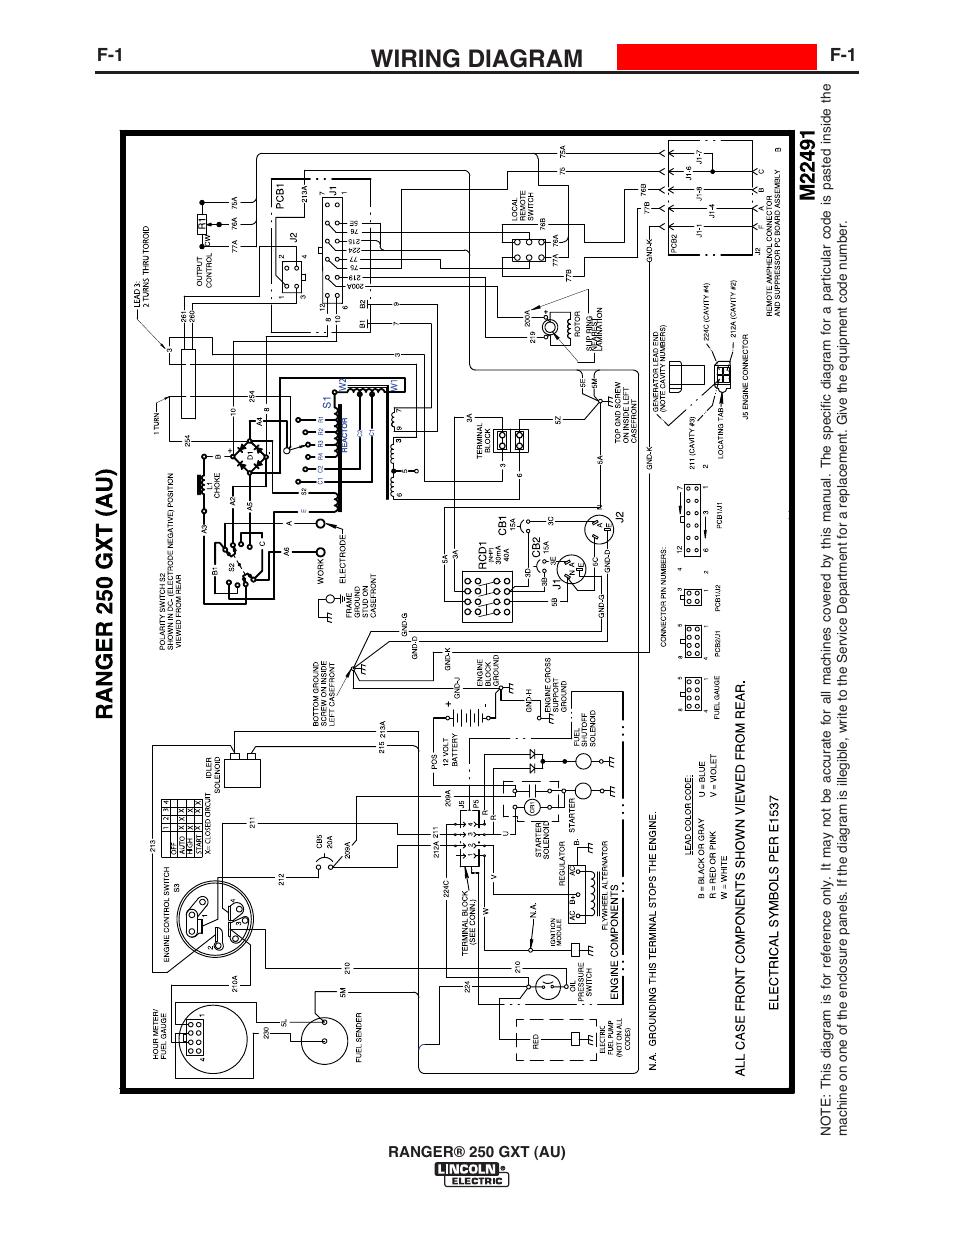 garmin 250 wiring diagram